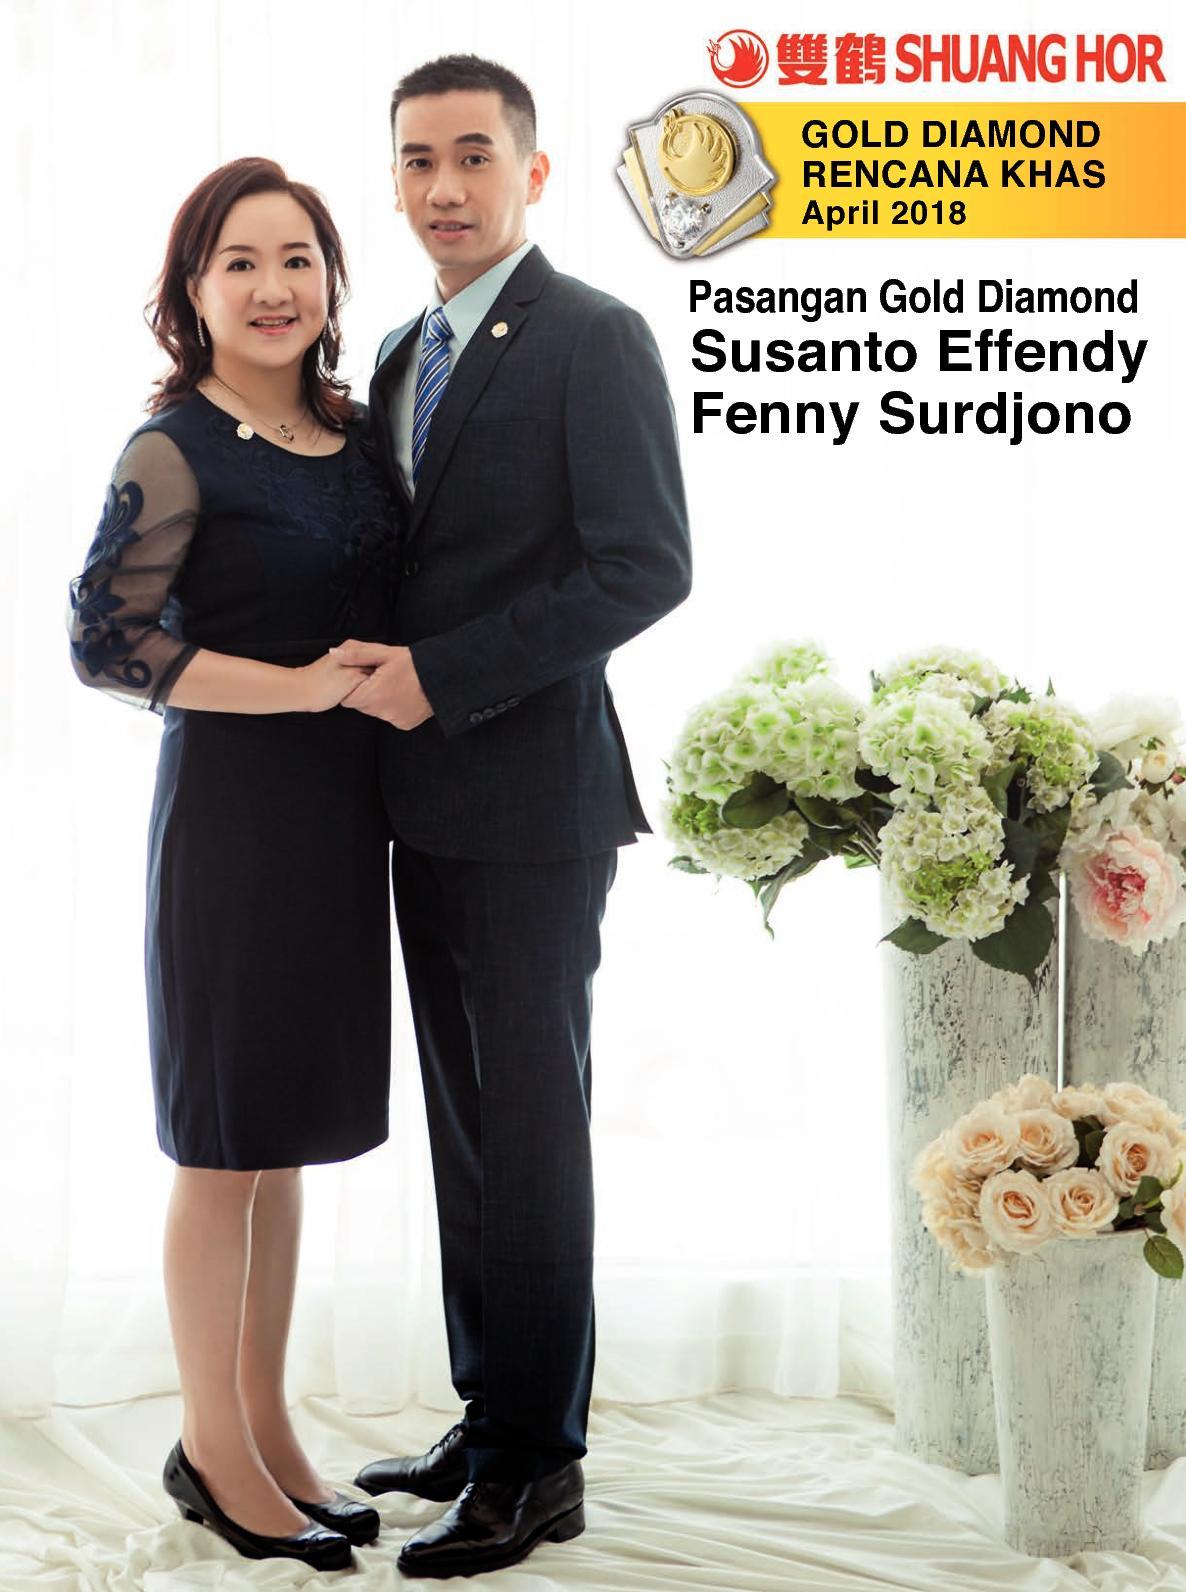 Gold Diamond Album April 2018 (Malay)